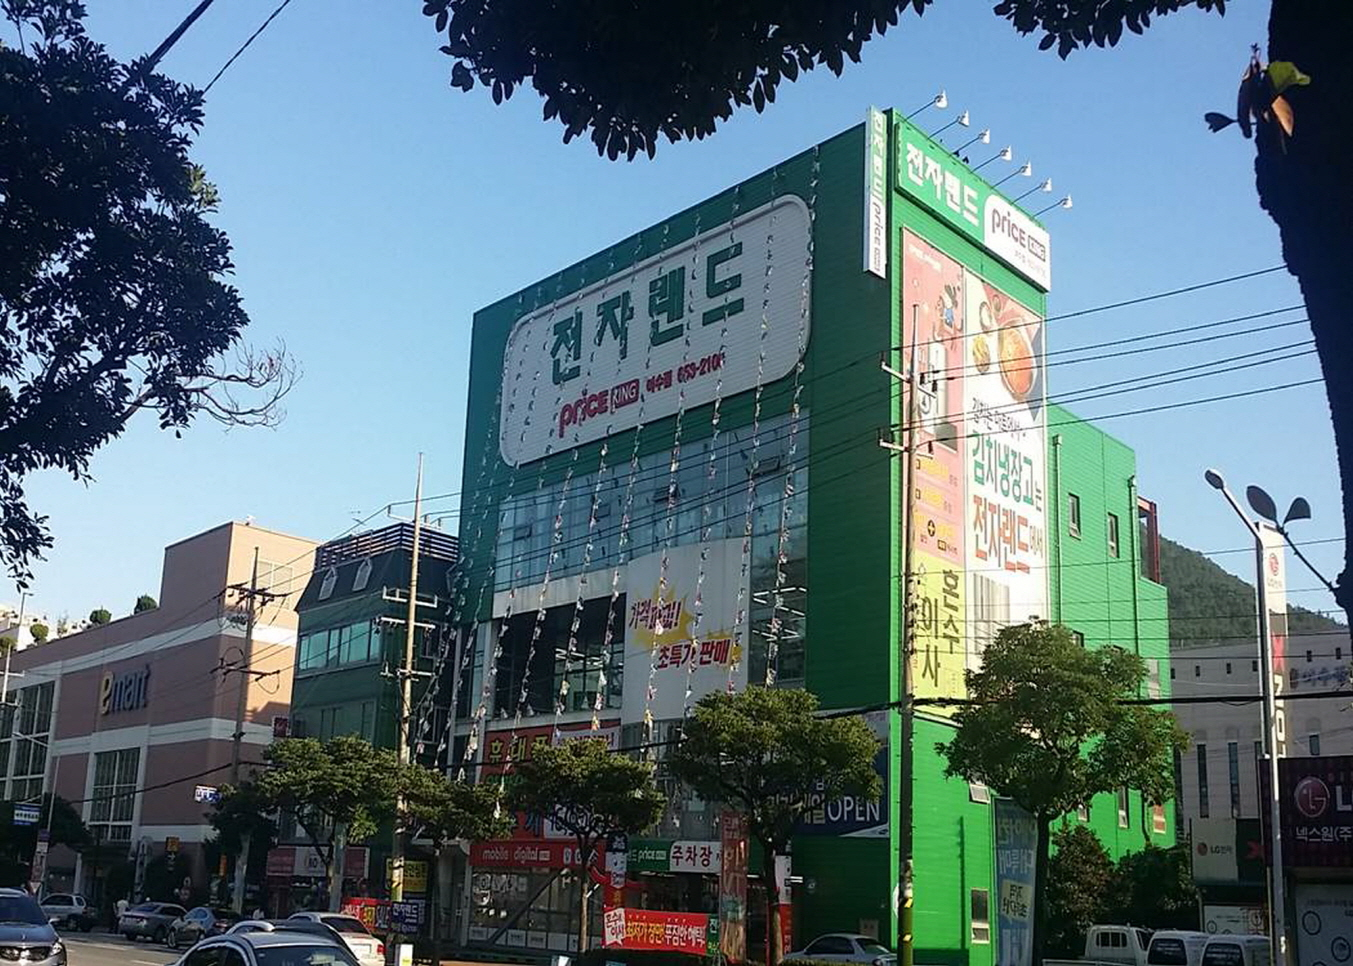 ET Land Price King – Yeosu Branch (전자랜드 프라이스킹 (여수점))